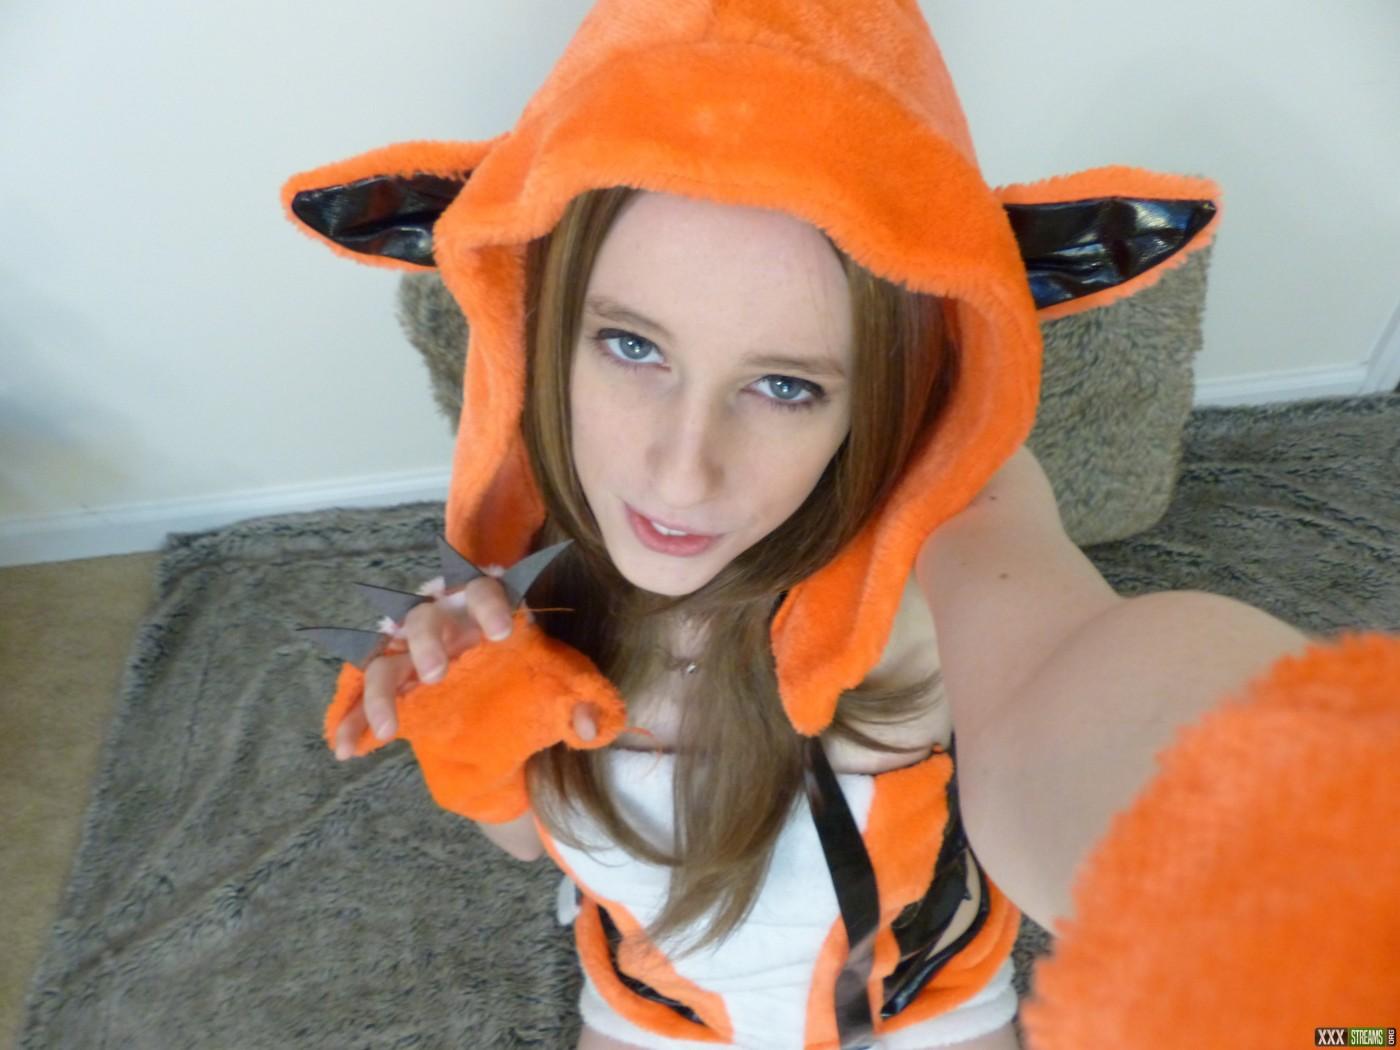 FoxyGamer_cb_14388349700007ed337d0c4cc638e.jpg